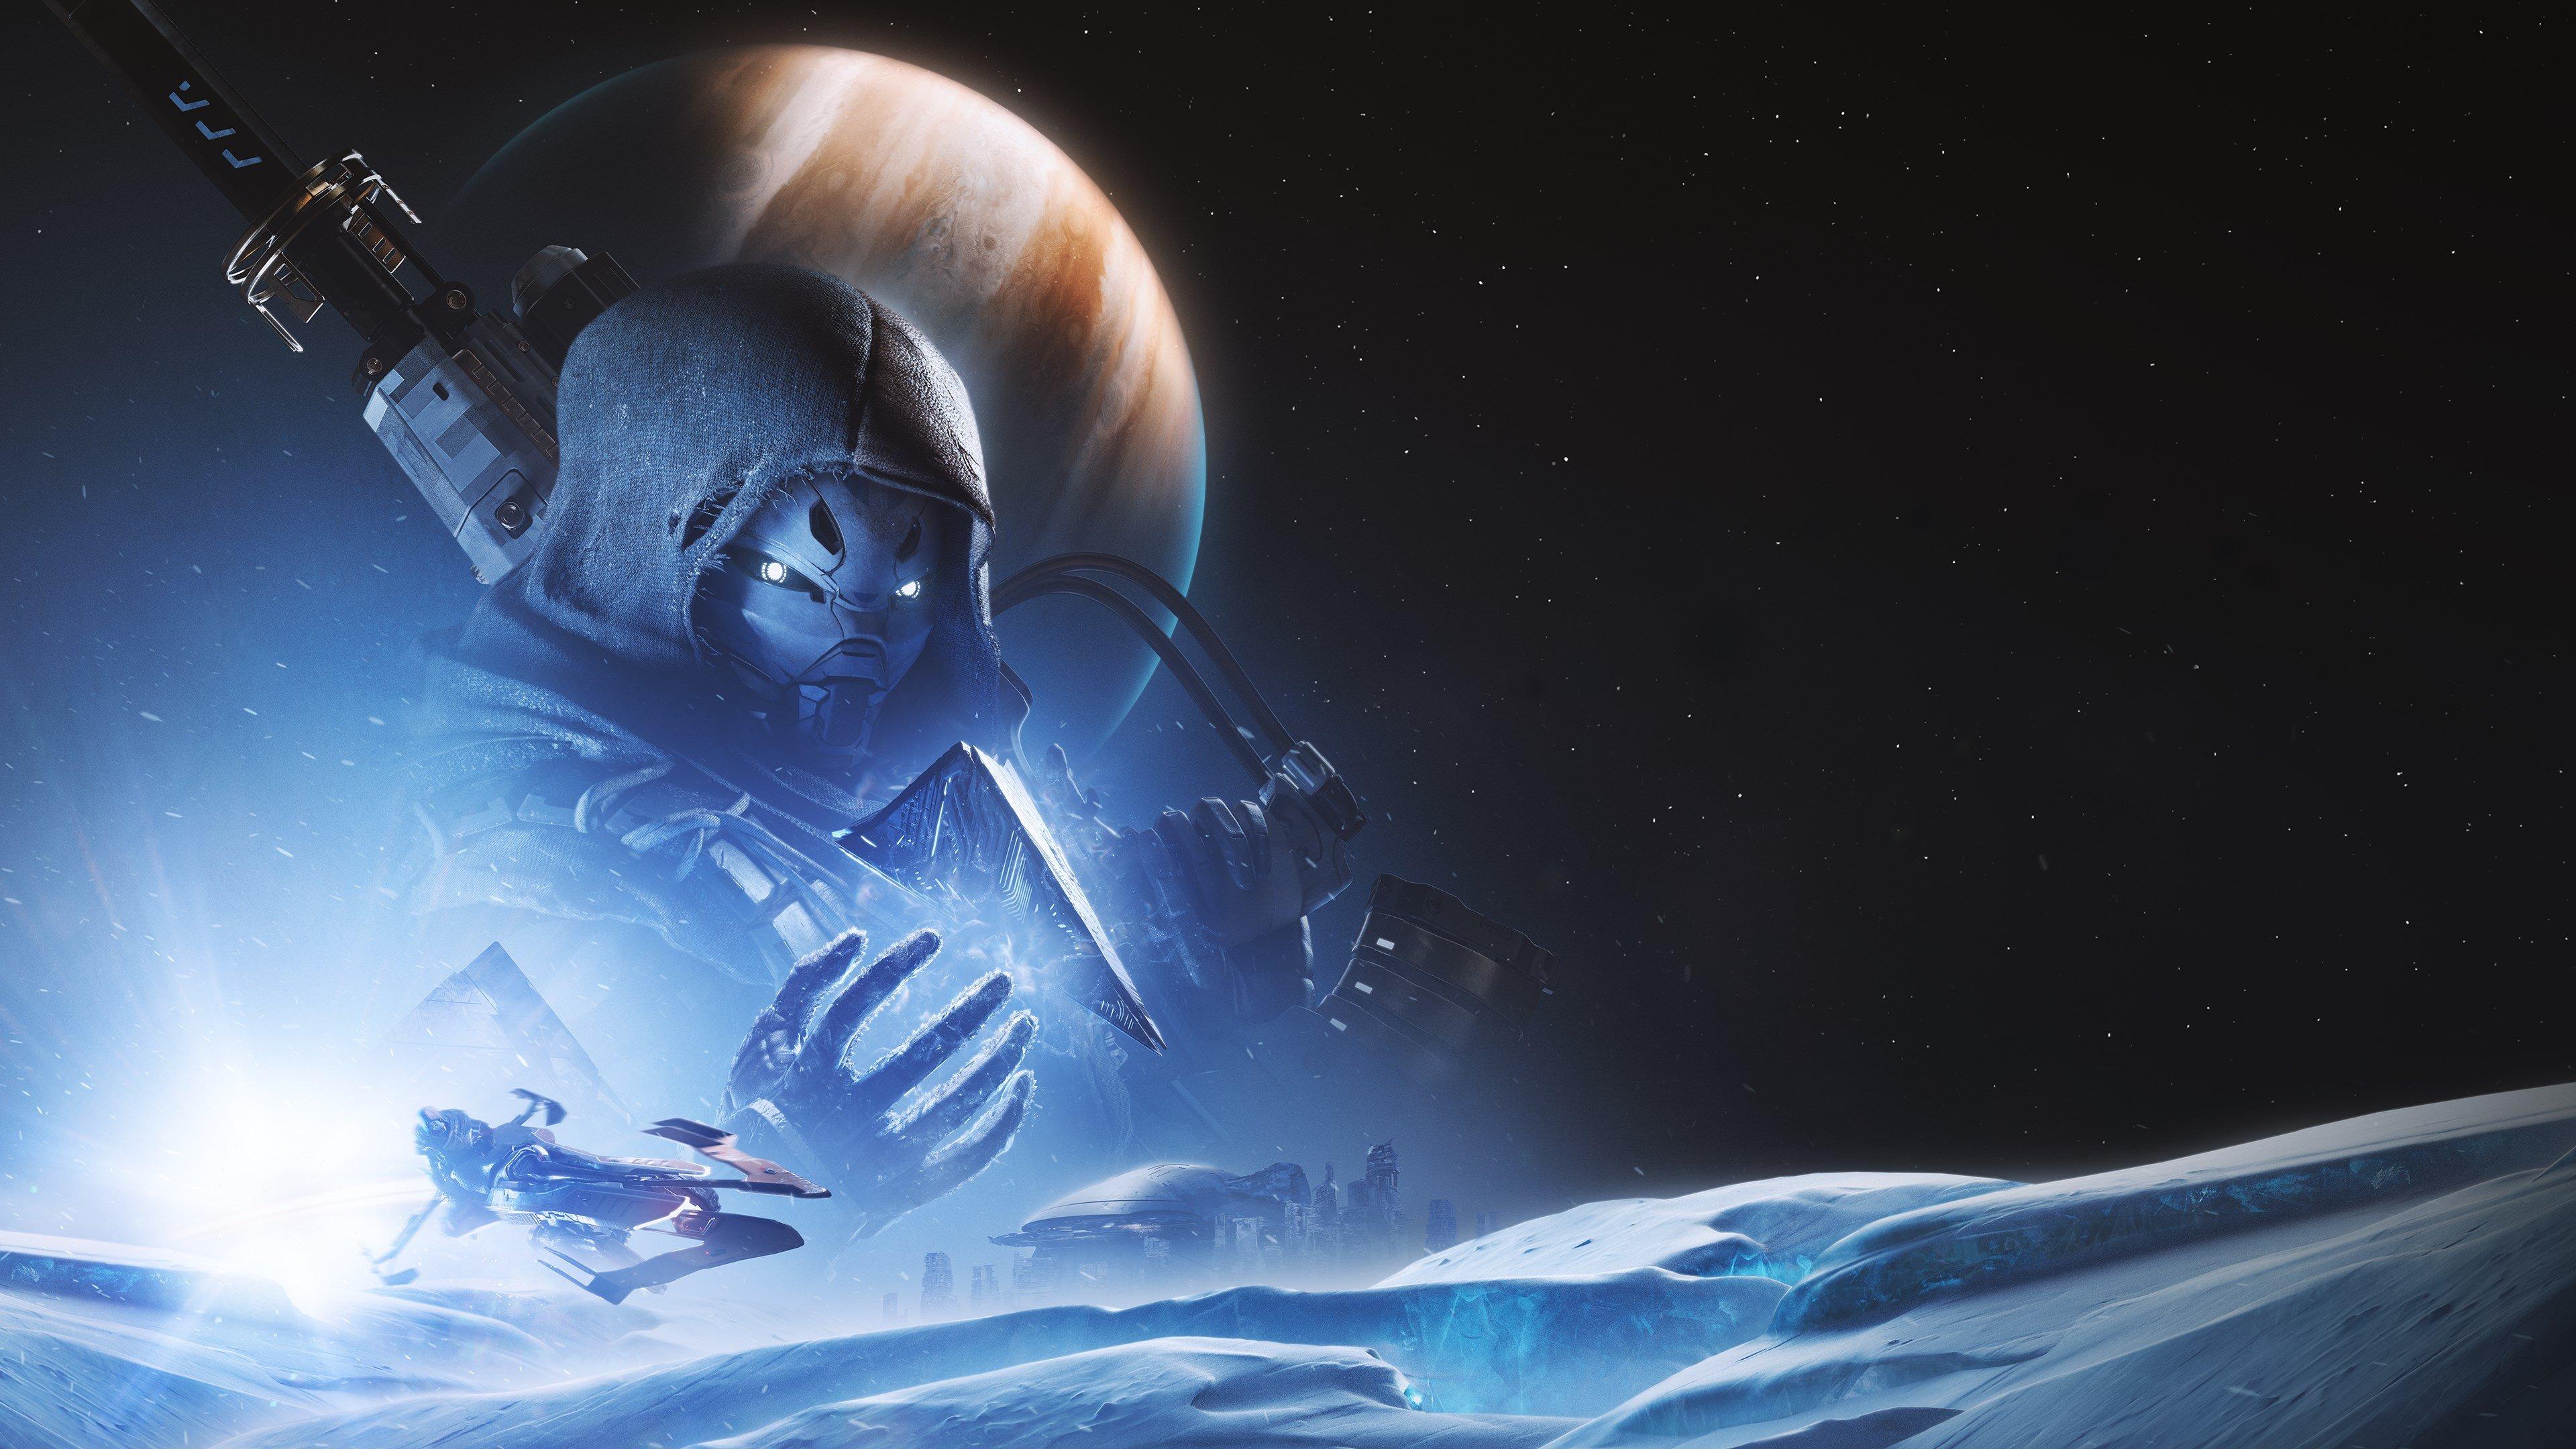 Fondos de pantalla Destiny 2 Beyond Light